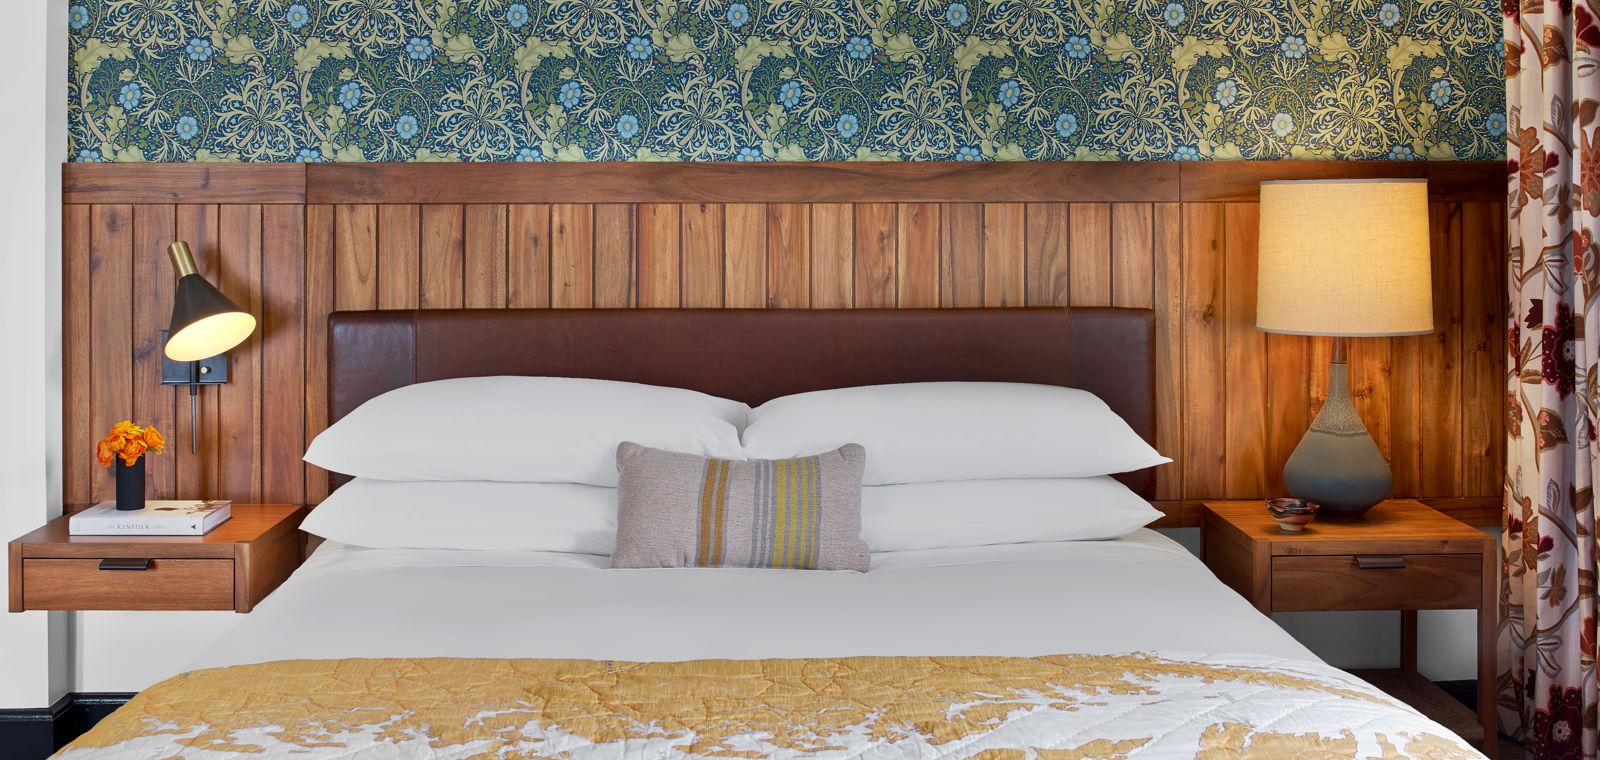 Revival_GuestRooms_Standard King Bed